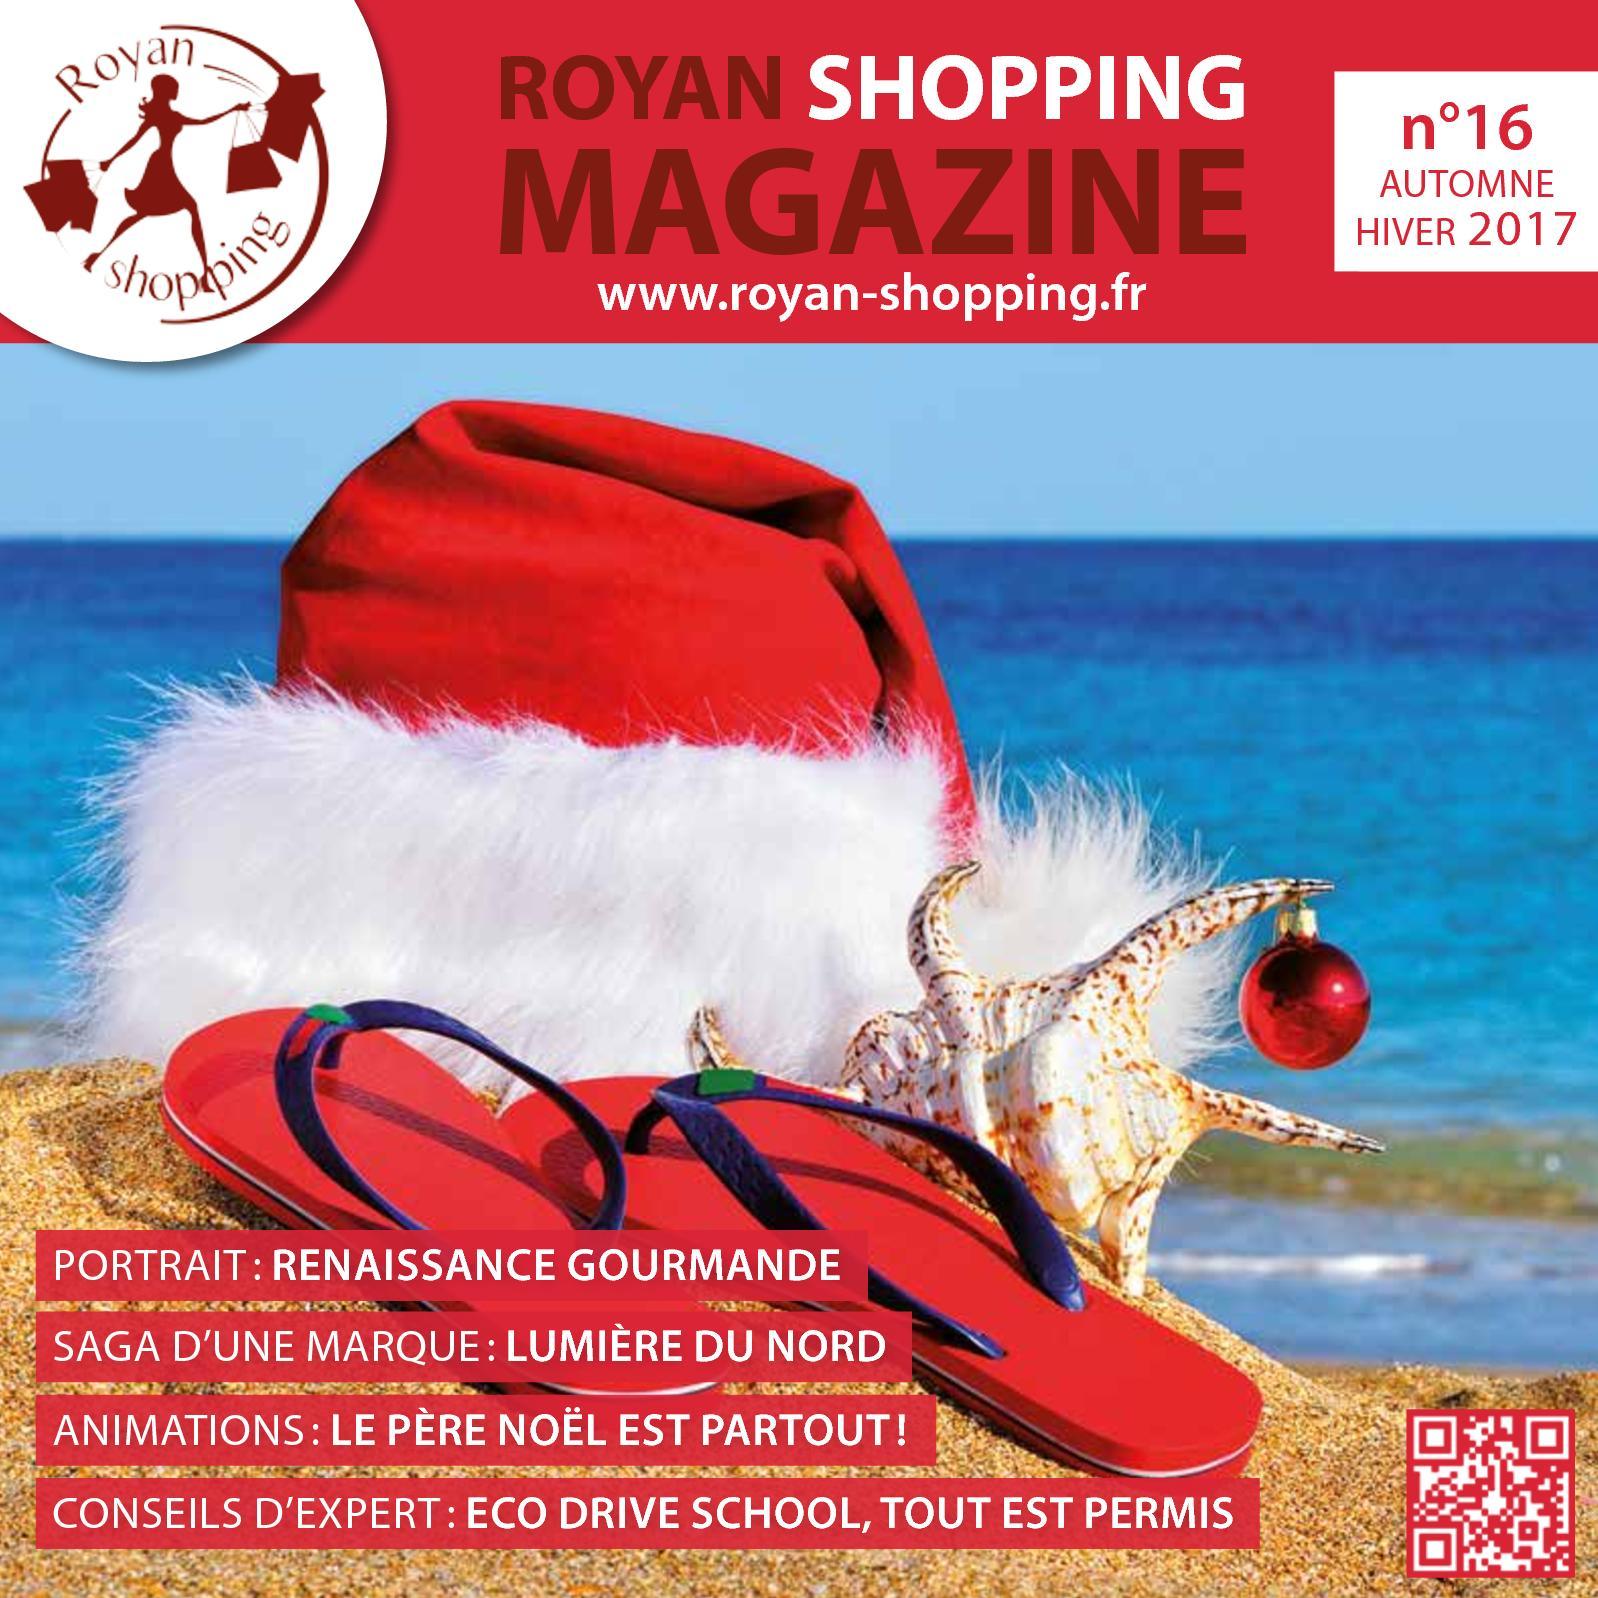 Boulanger Miroir Grossissant Frais Stock Calaméo Royan Shopping Magazine N°16